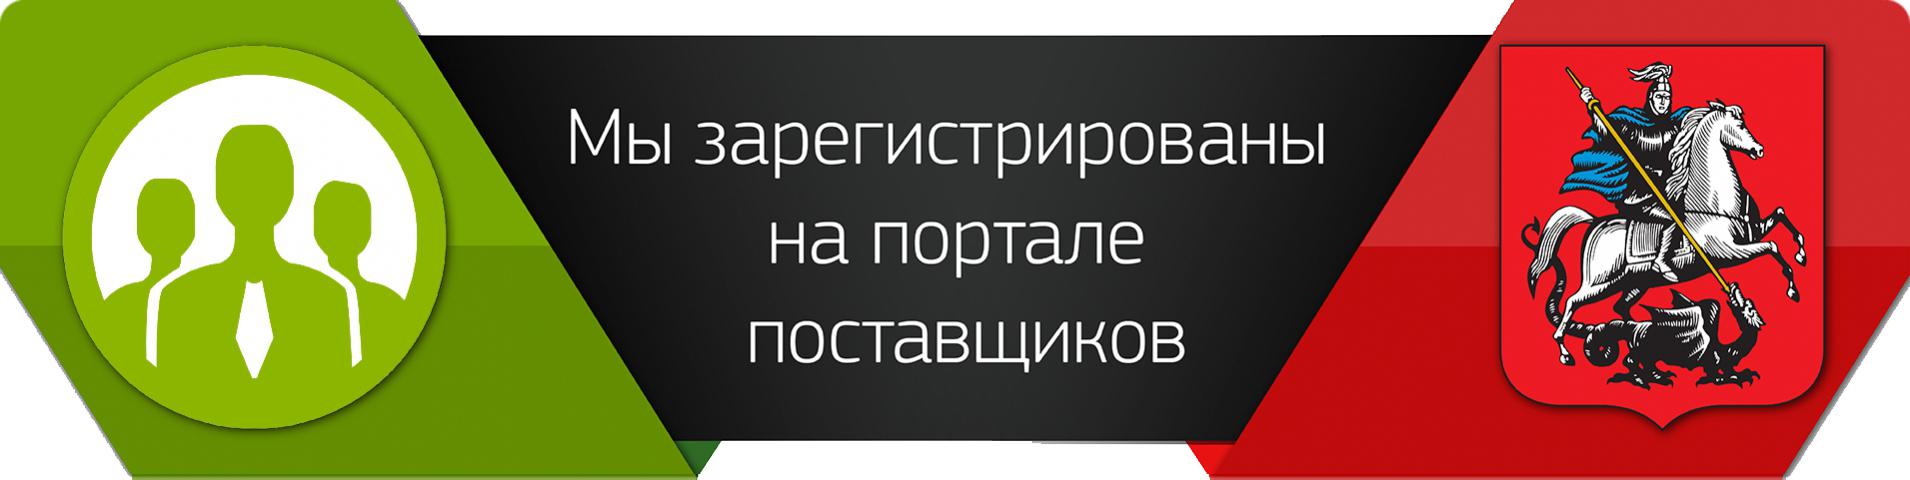 О нас - фото portal_postavschikov.jpg